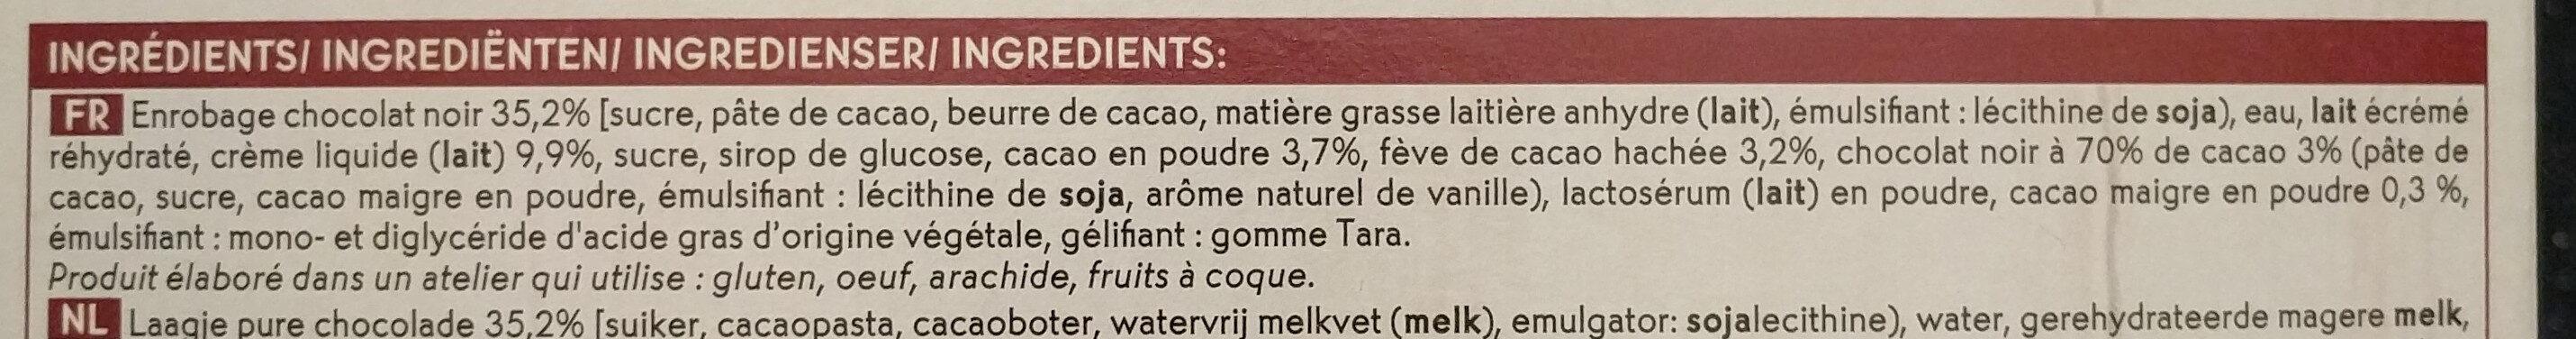 Chocolat 70% cacao - Ingrédients - fr